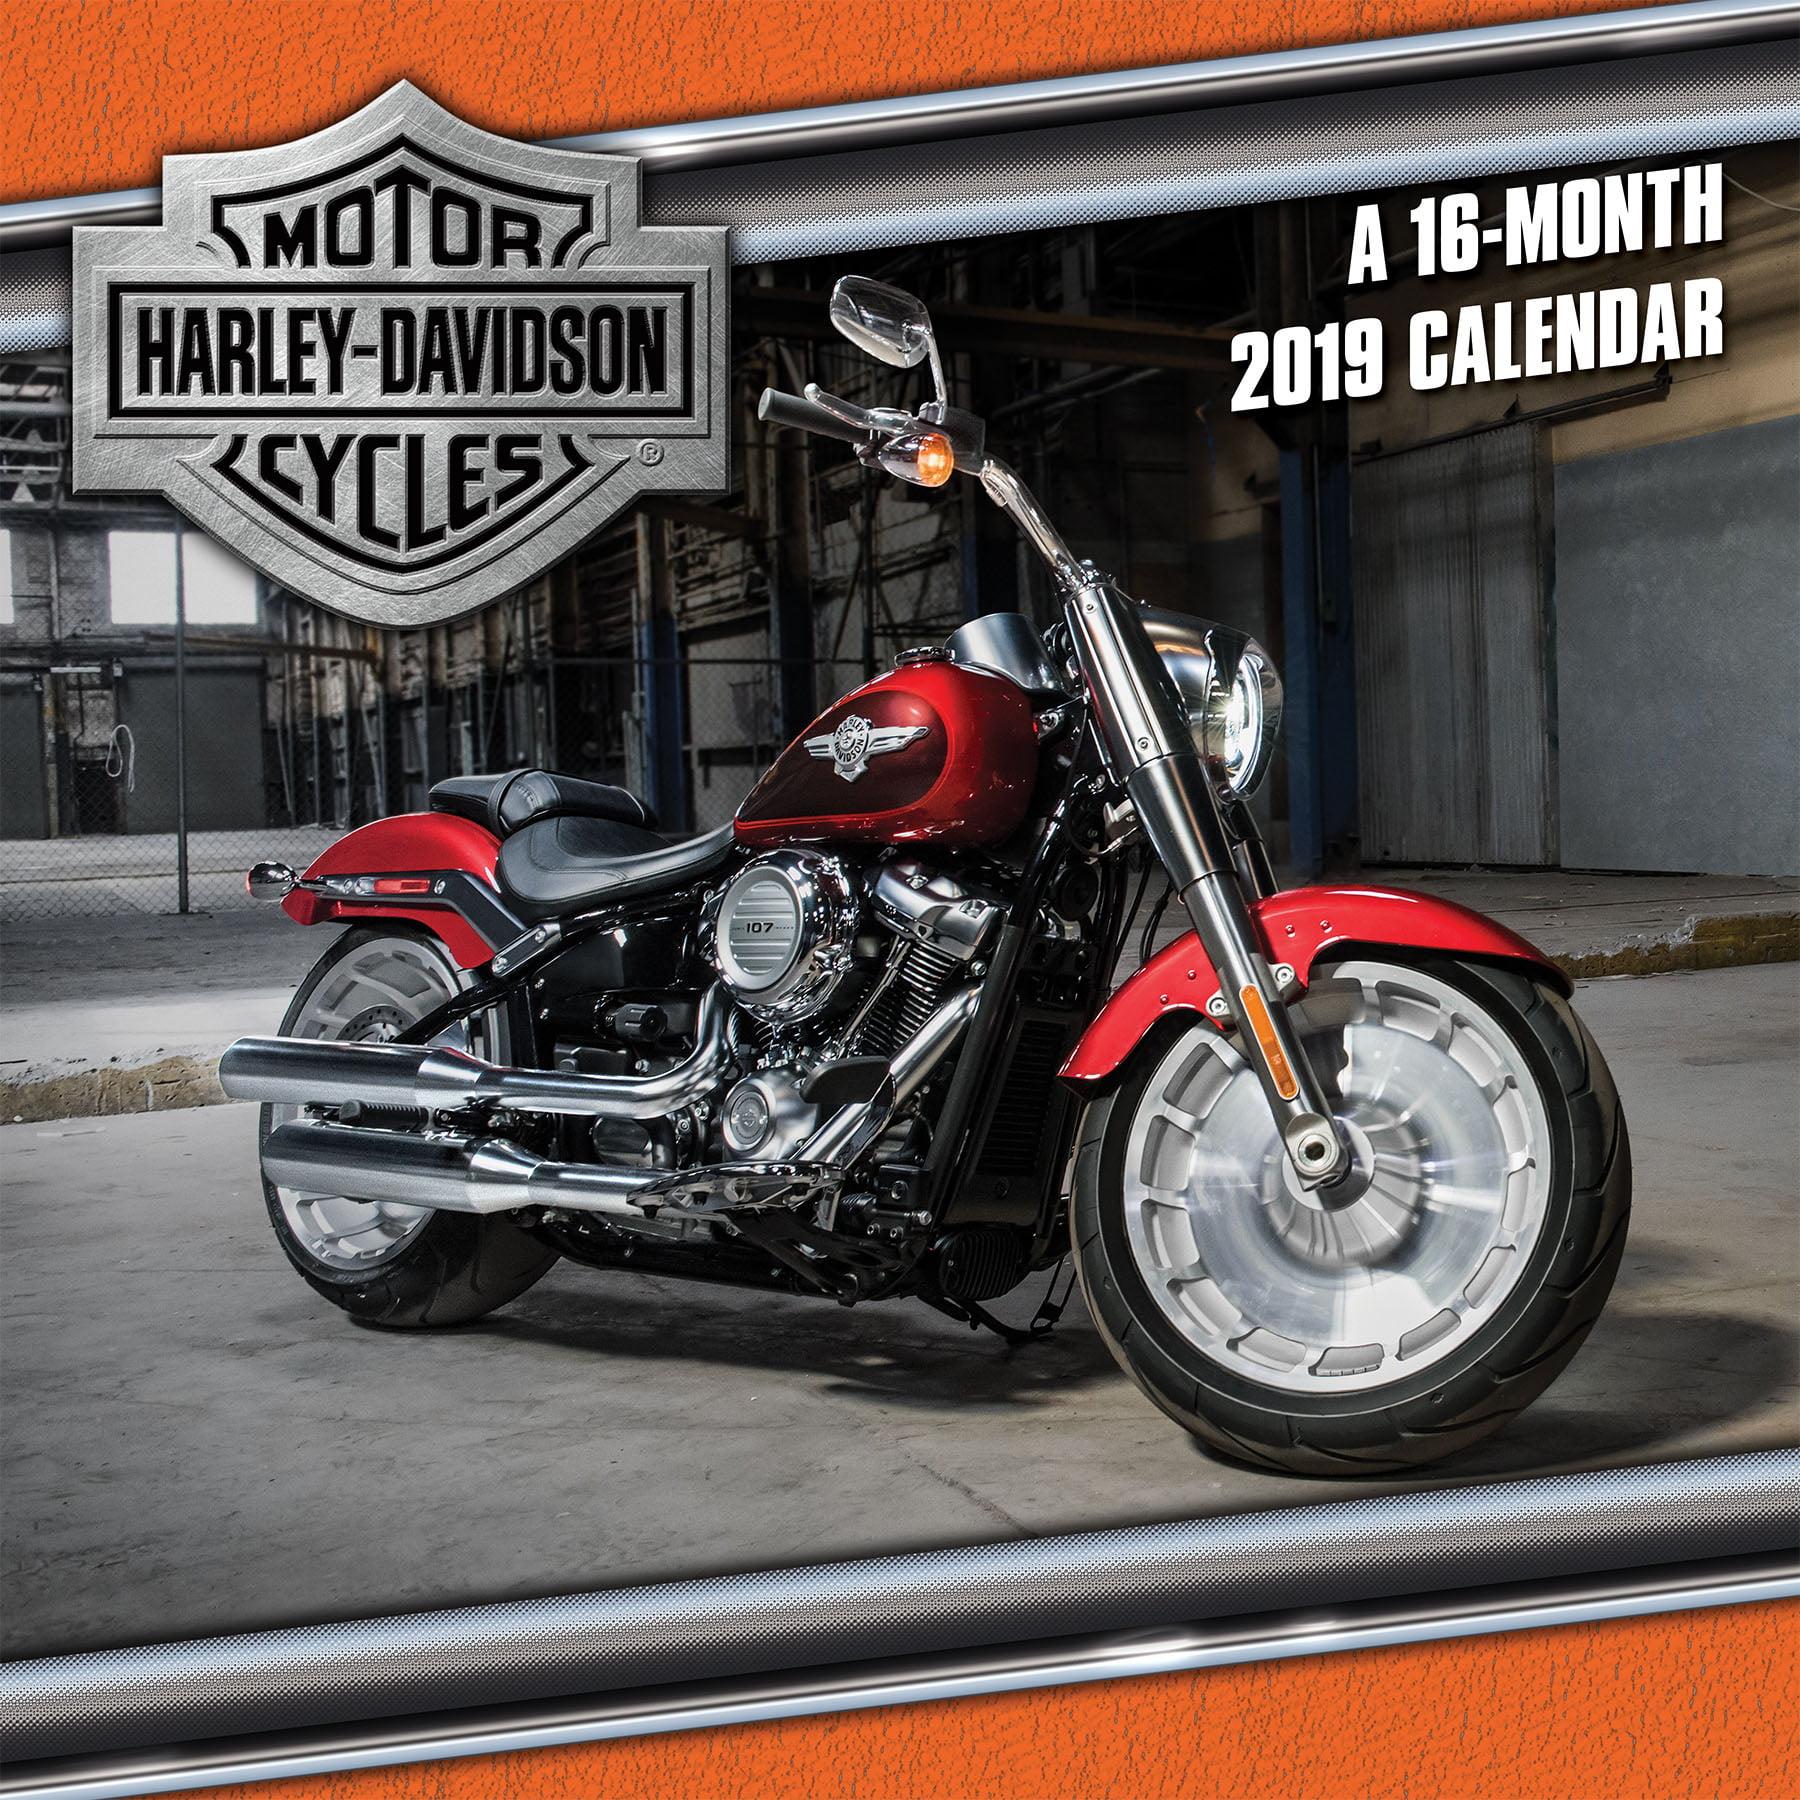 2019 Harley-Davidson Wall Calendar by Trends International